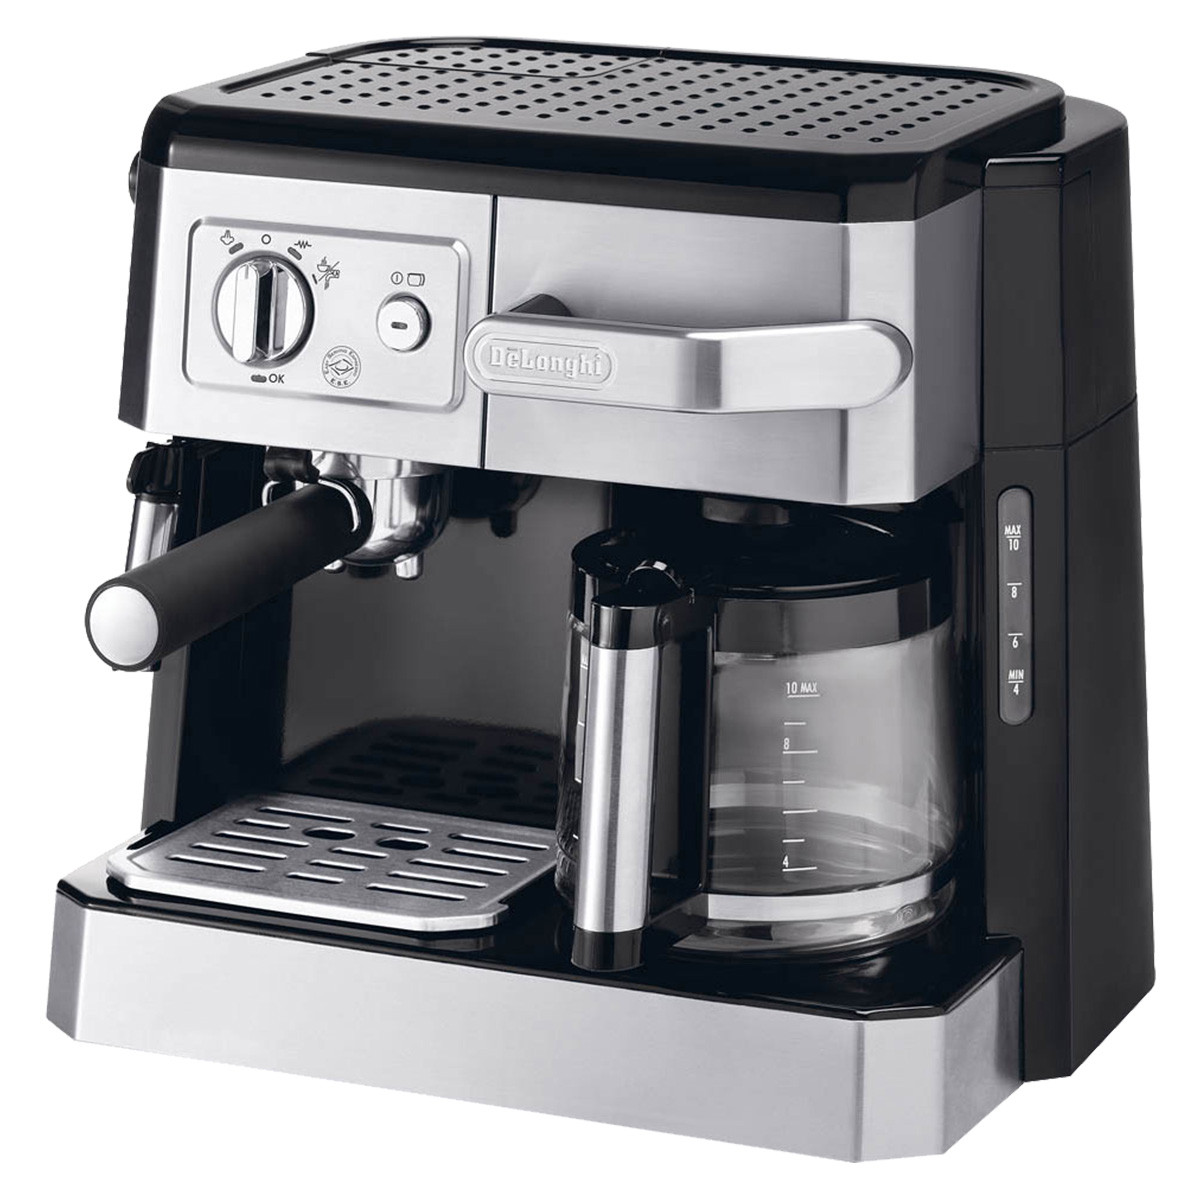 عکس اسپرسوساز دلونگی مدل BCO420 Delonghi BCO420 Espresso Maker اسپرسوساز-دلونگی-مدل-bco420